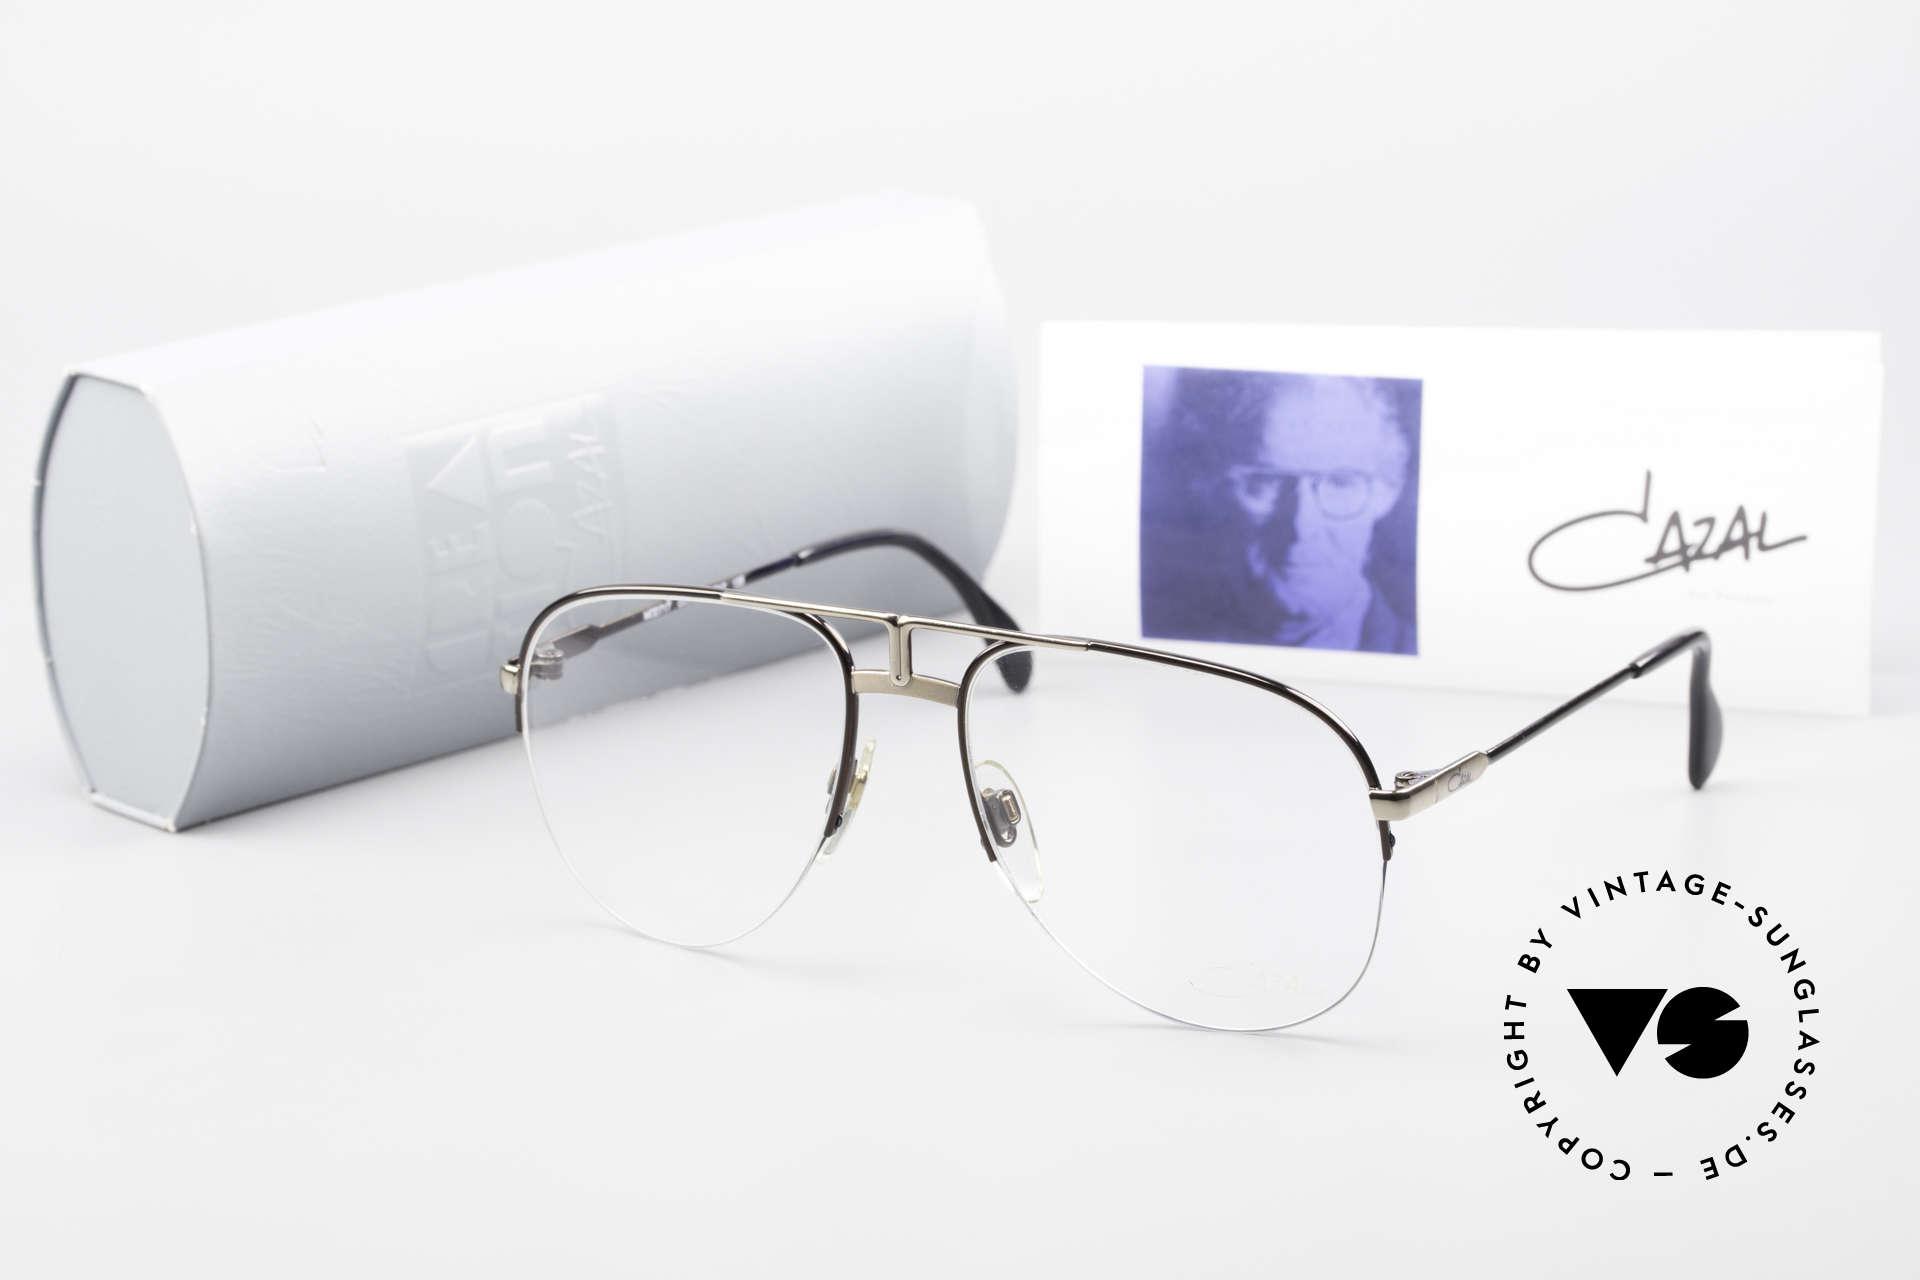 Cazal 717 Old 80's Glasses Semi Rimless, Size: medium, Made for Men